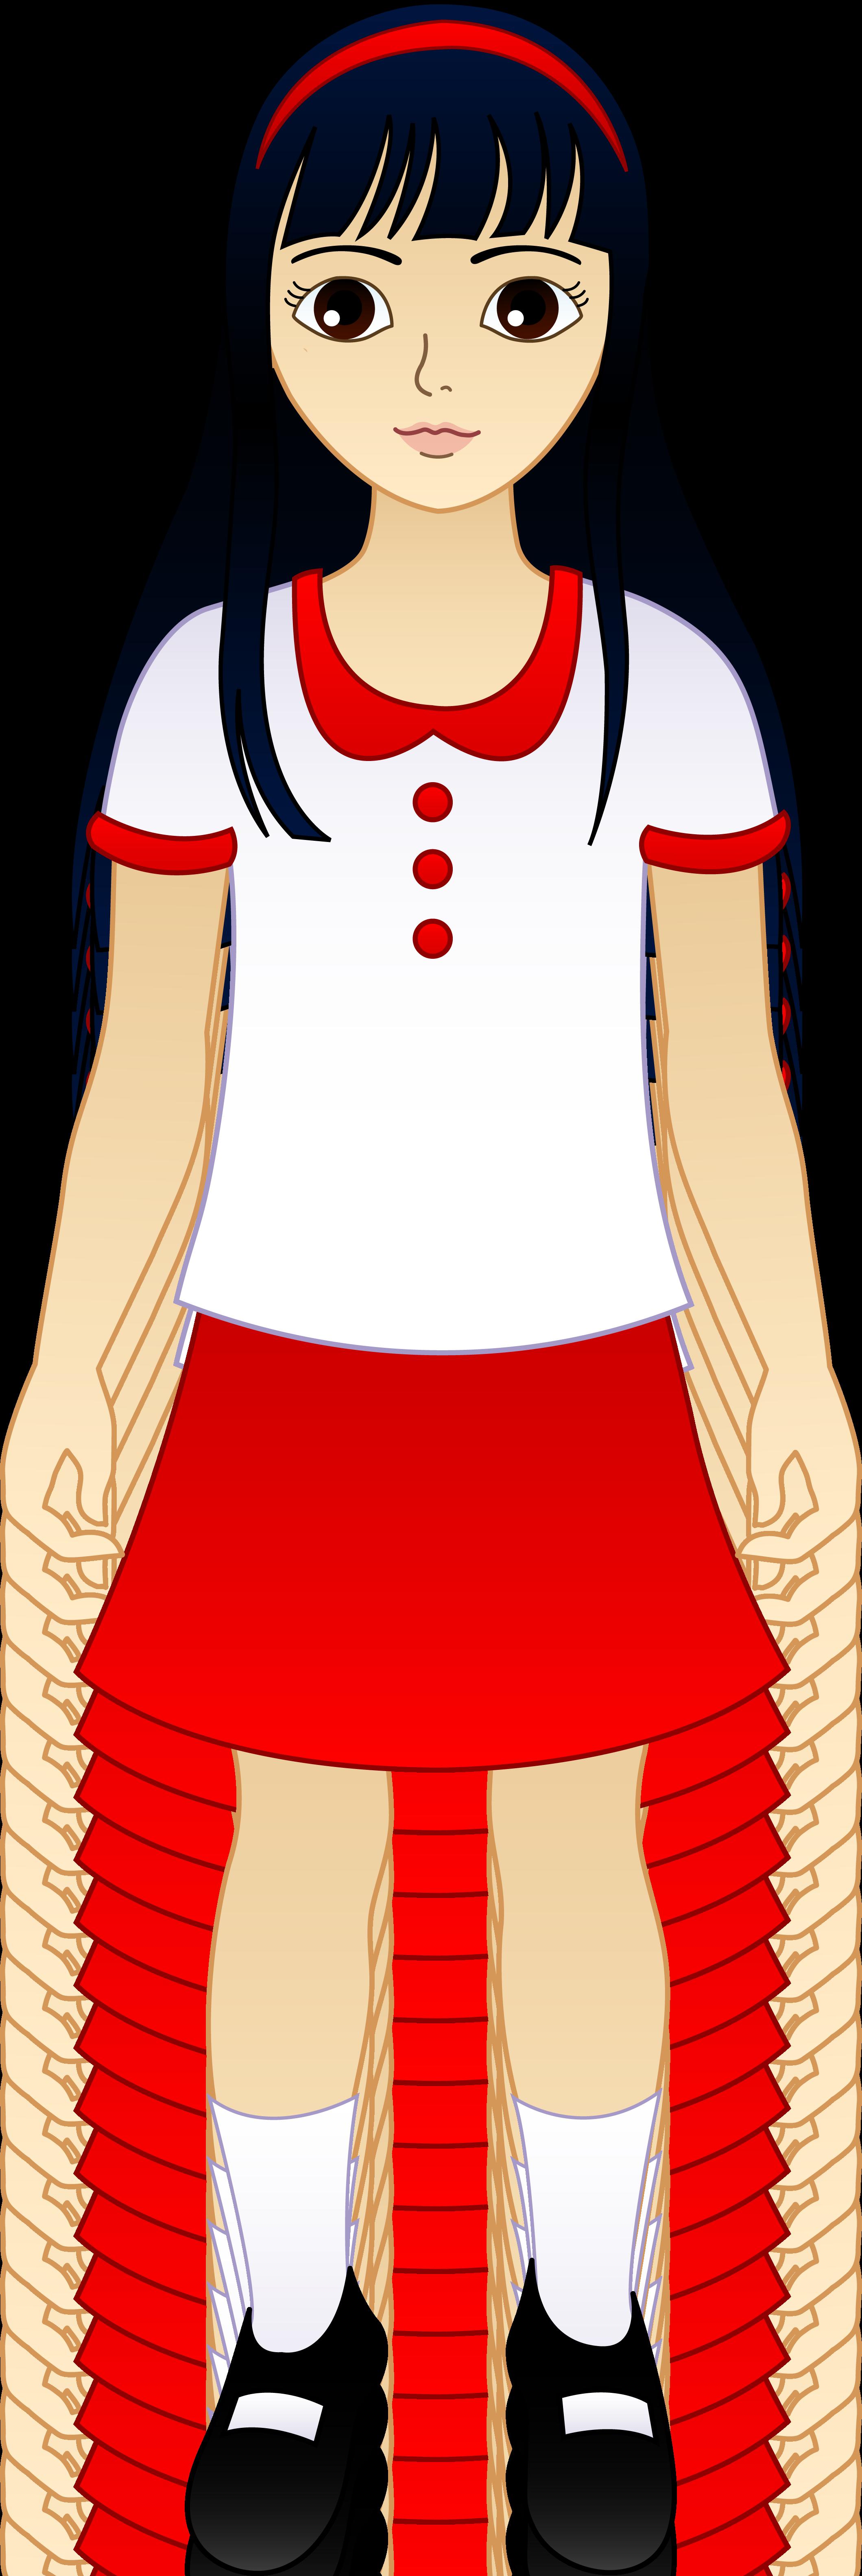 2119x6330 Uniform Clipart Elementary School